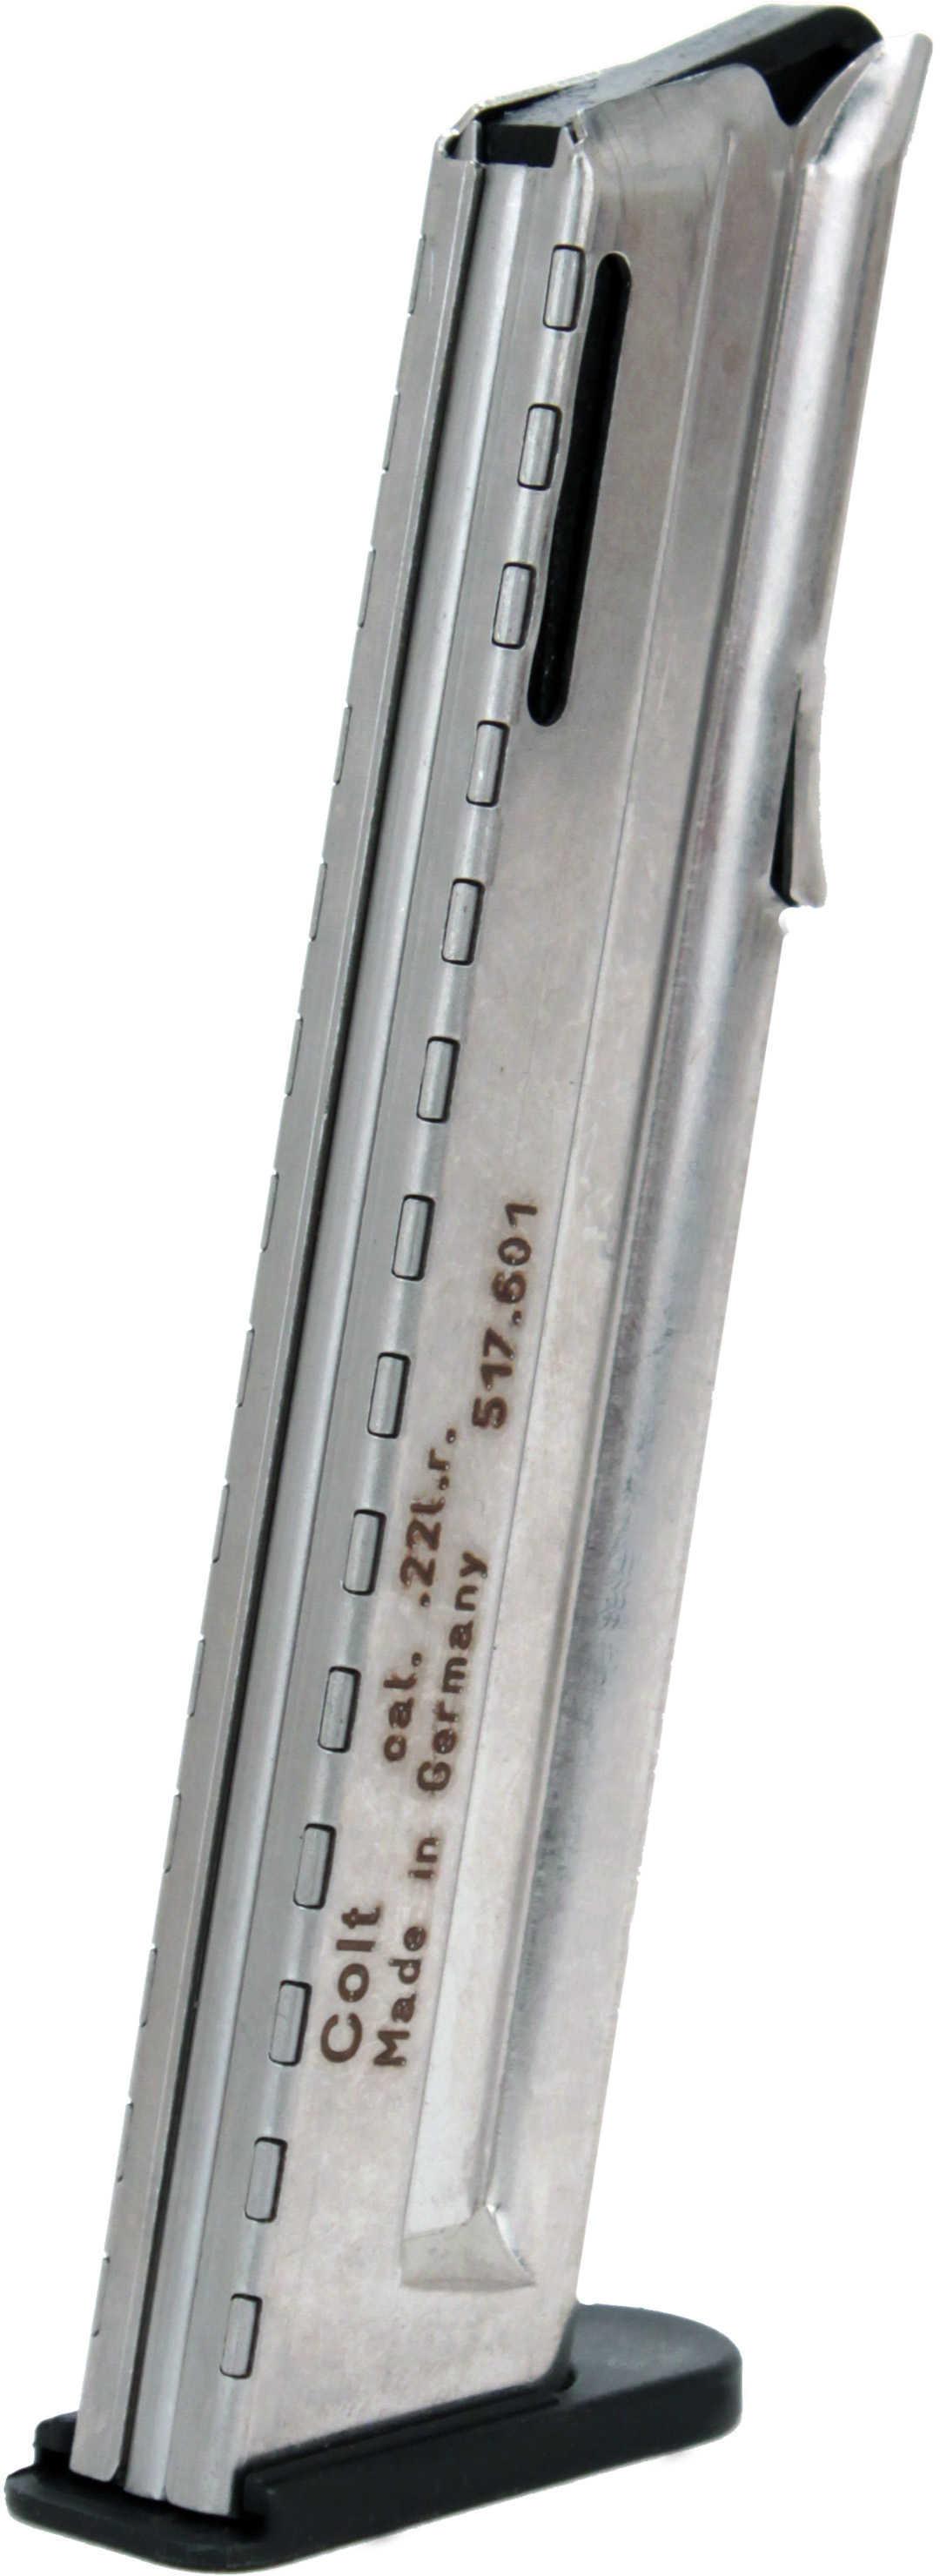 Walther Colt 1911 22LR Magazine 10 Round Md: 517604